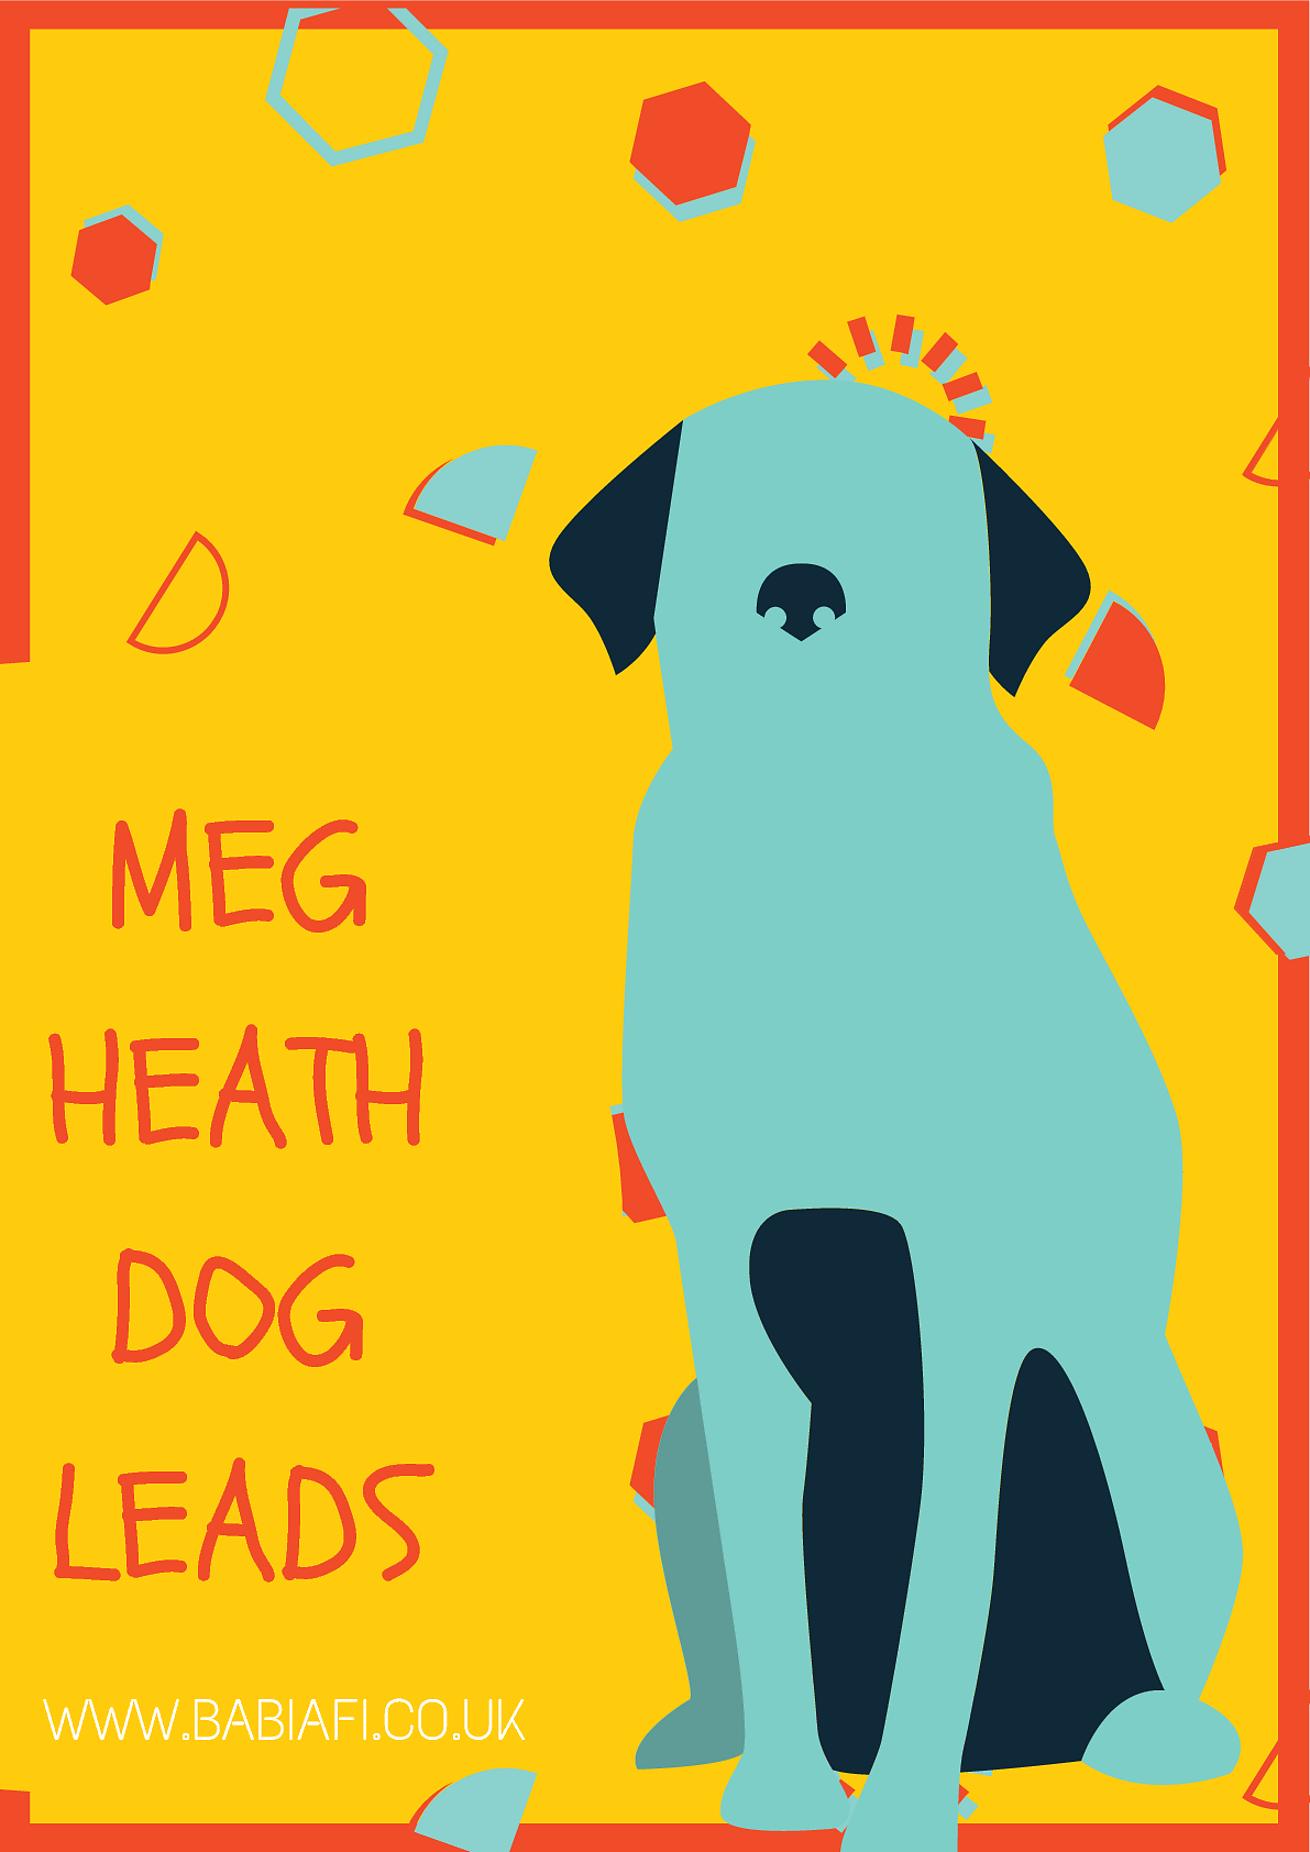 Meg Heath Dog Leads Review